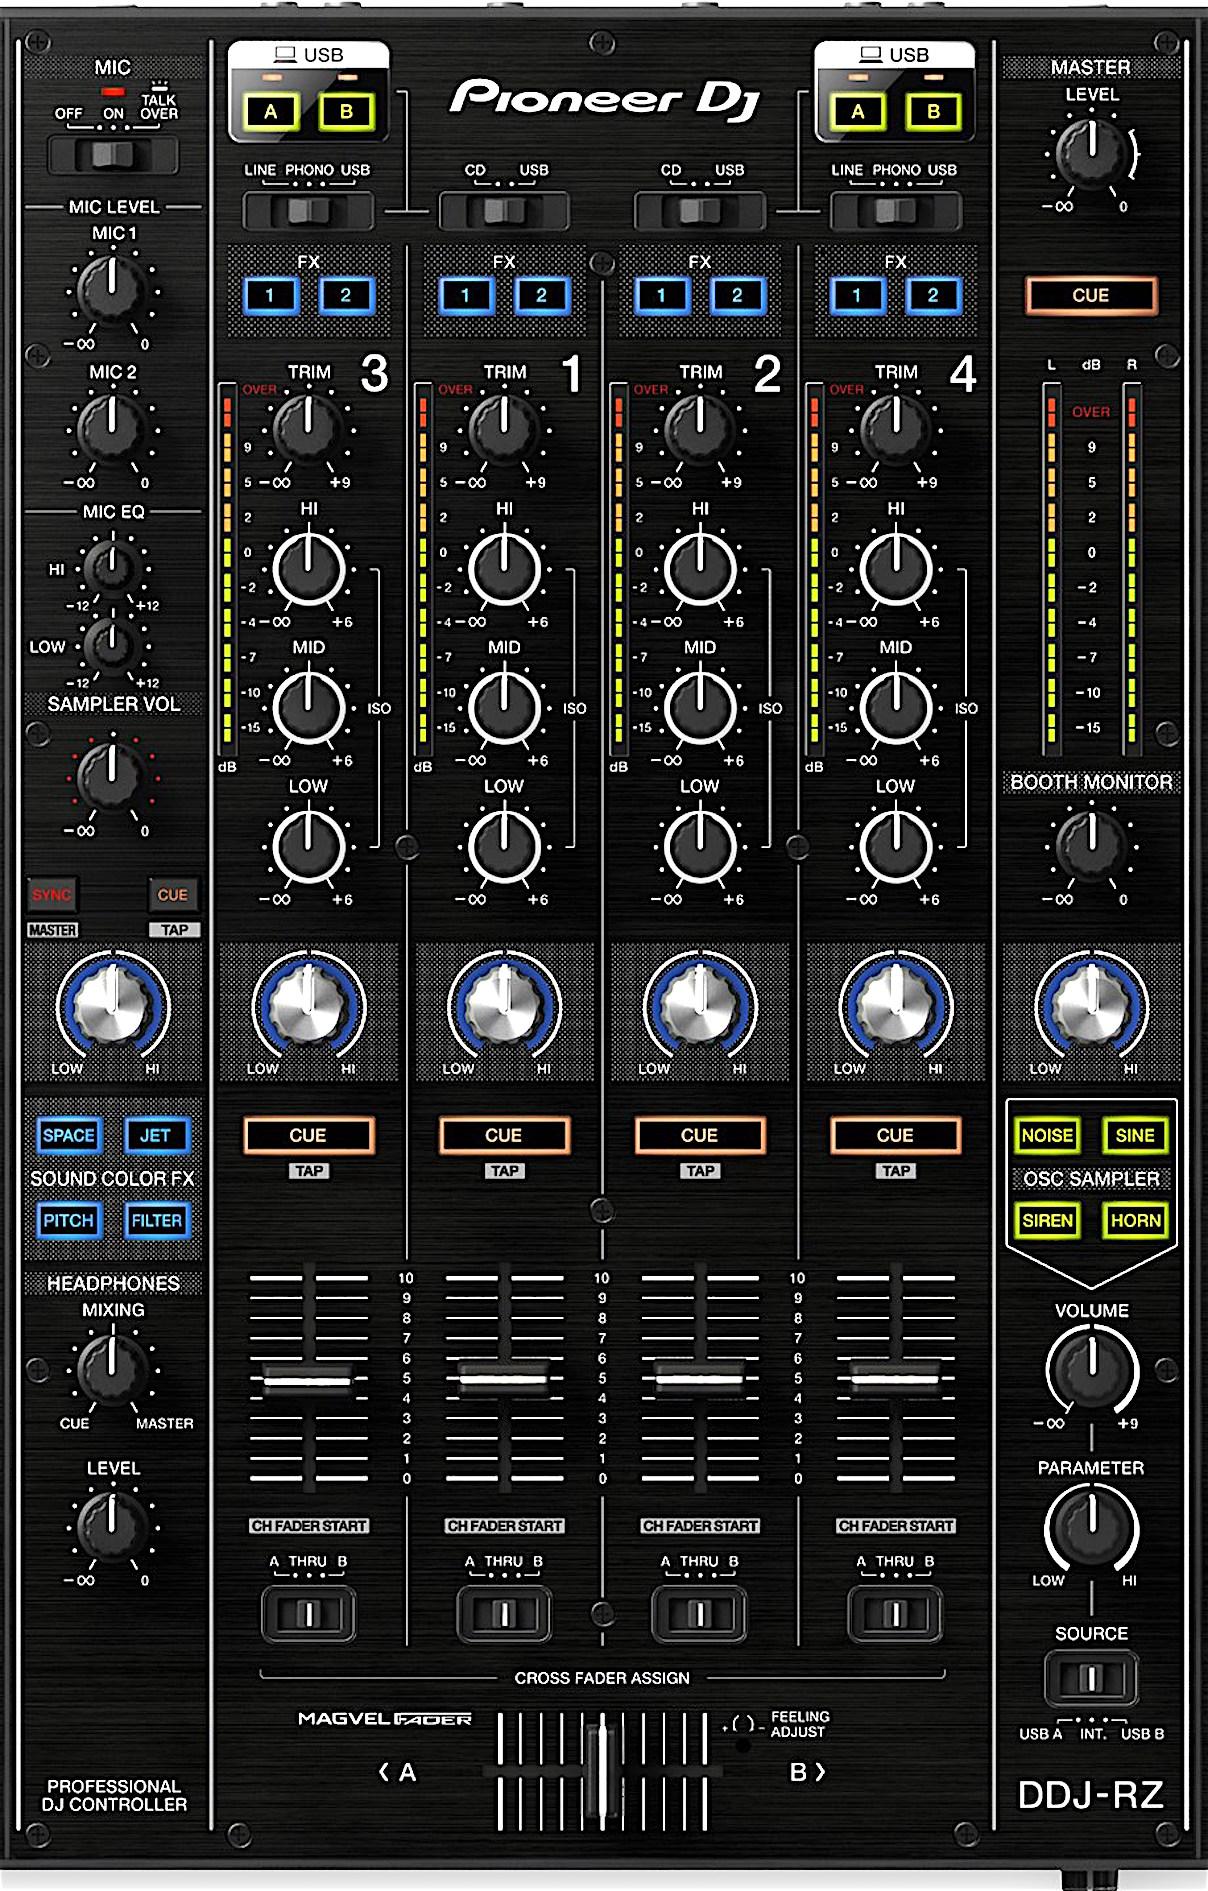 DDJ-RZ mixer